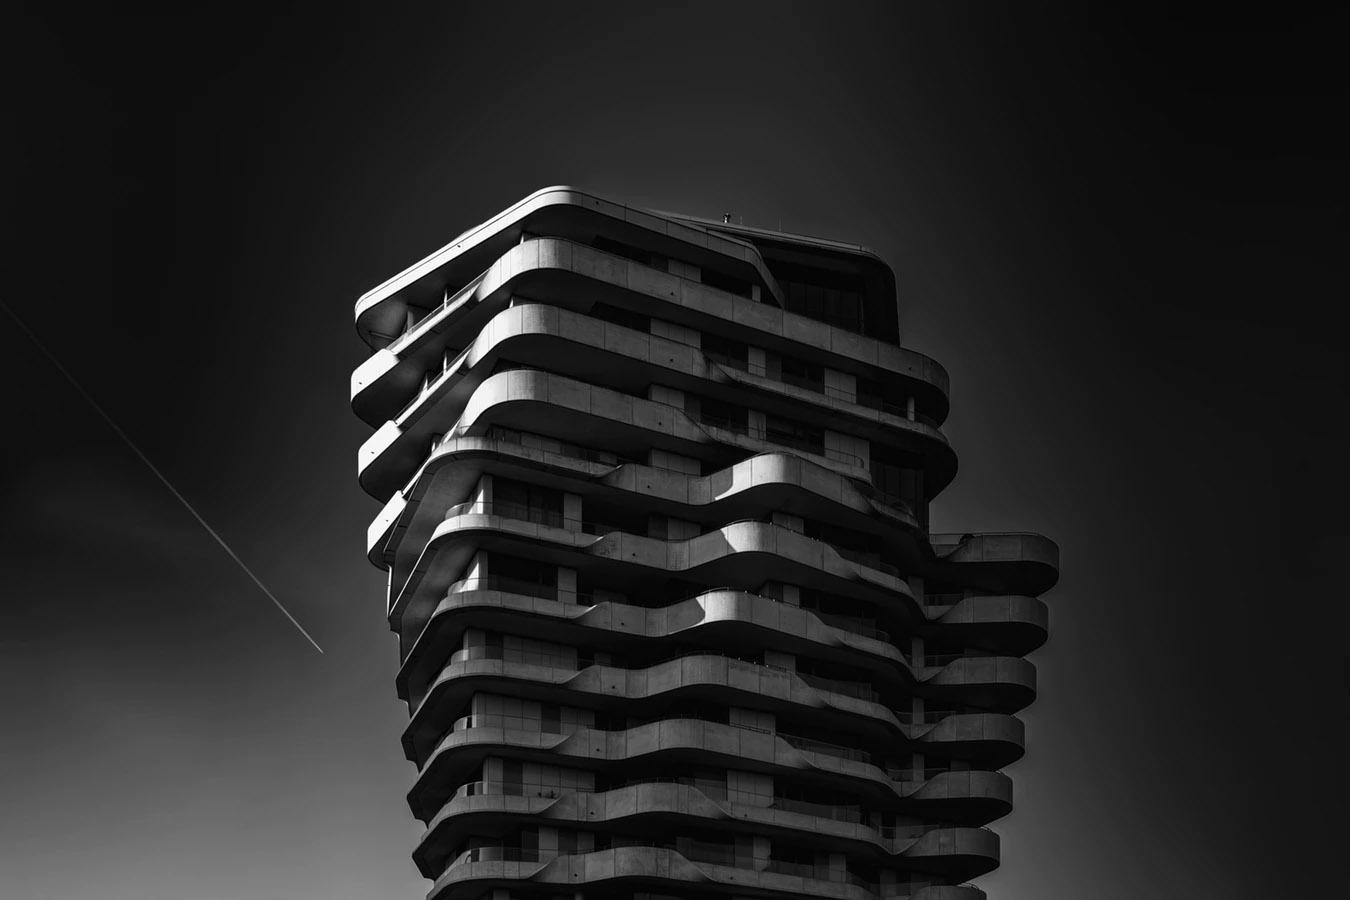 Archisoup-black-white-building-photography.jpg